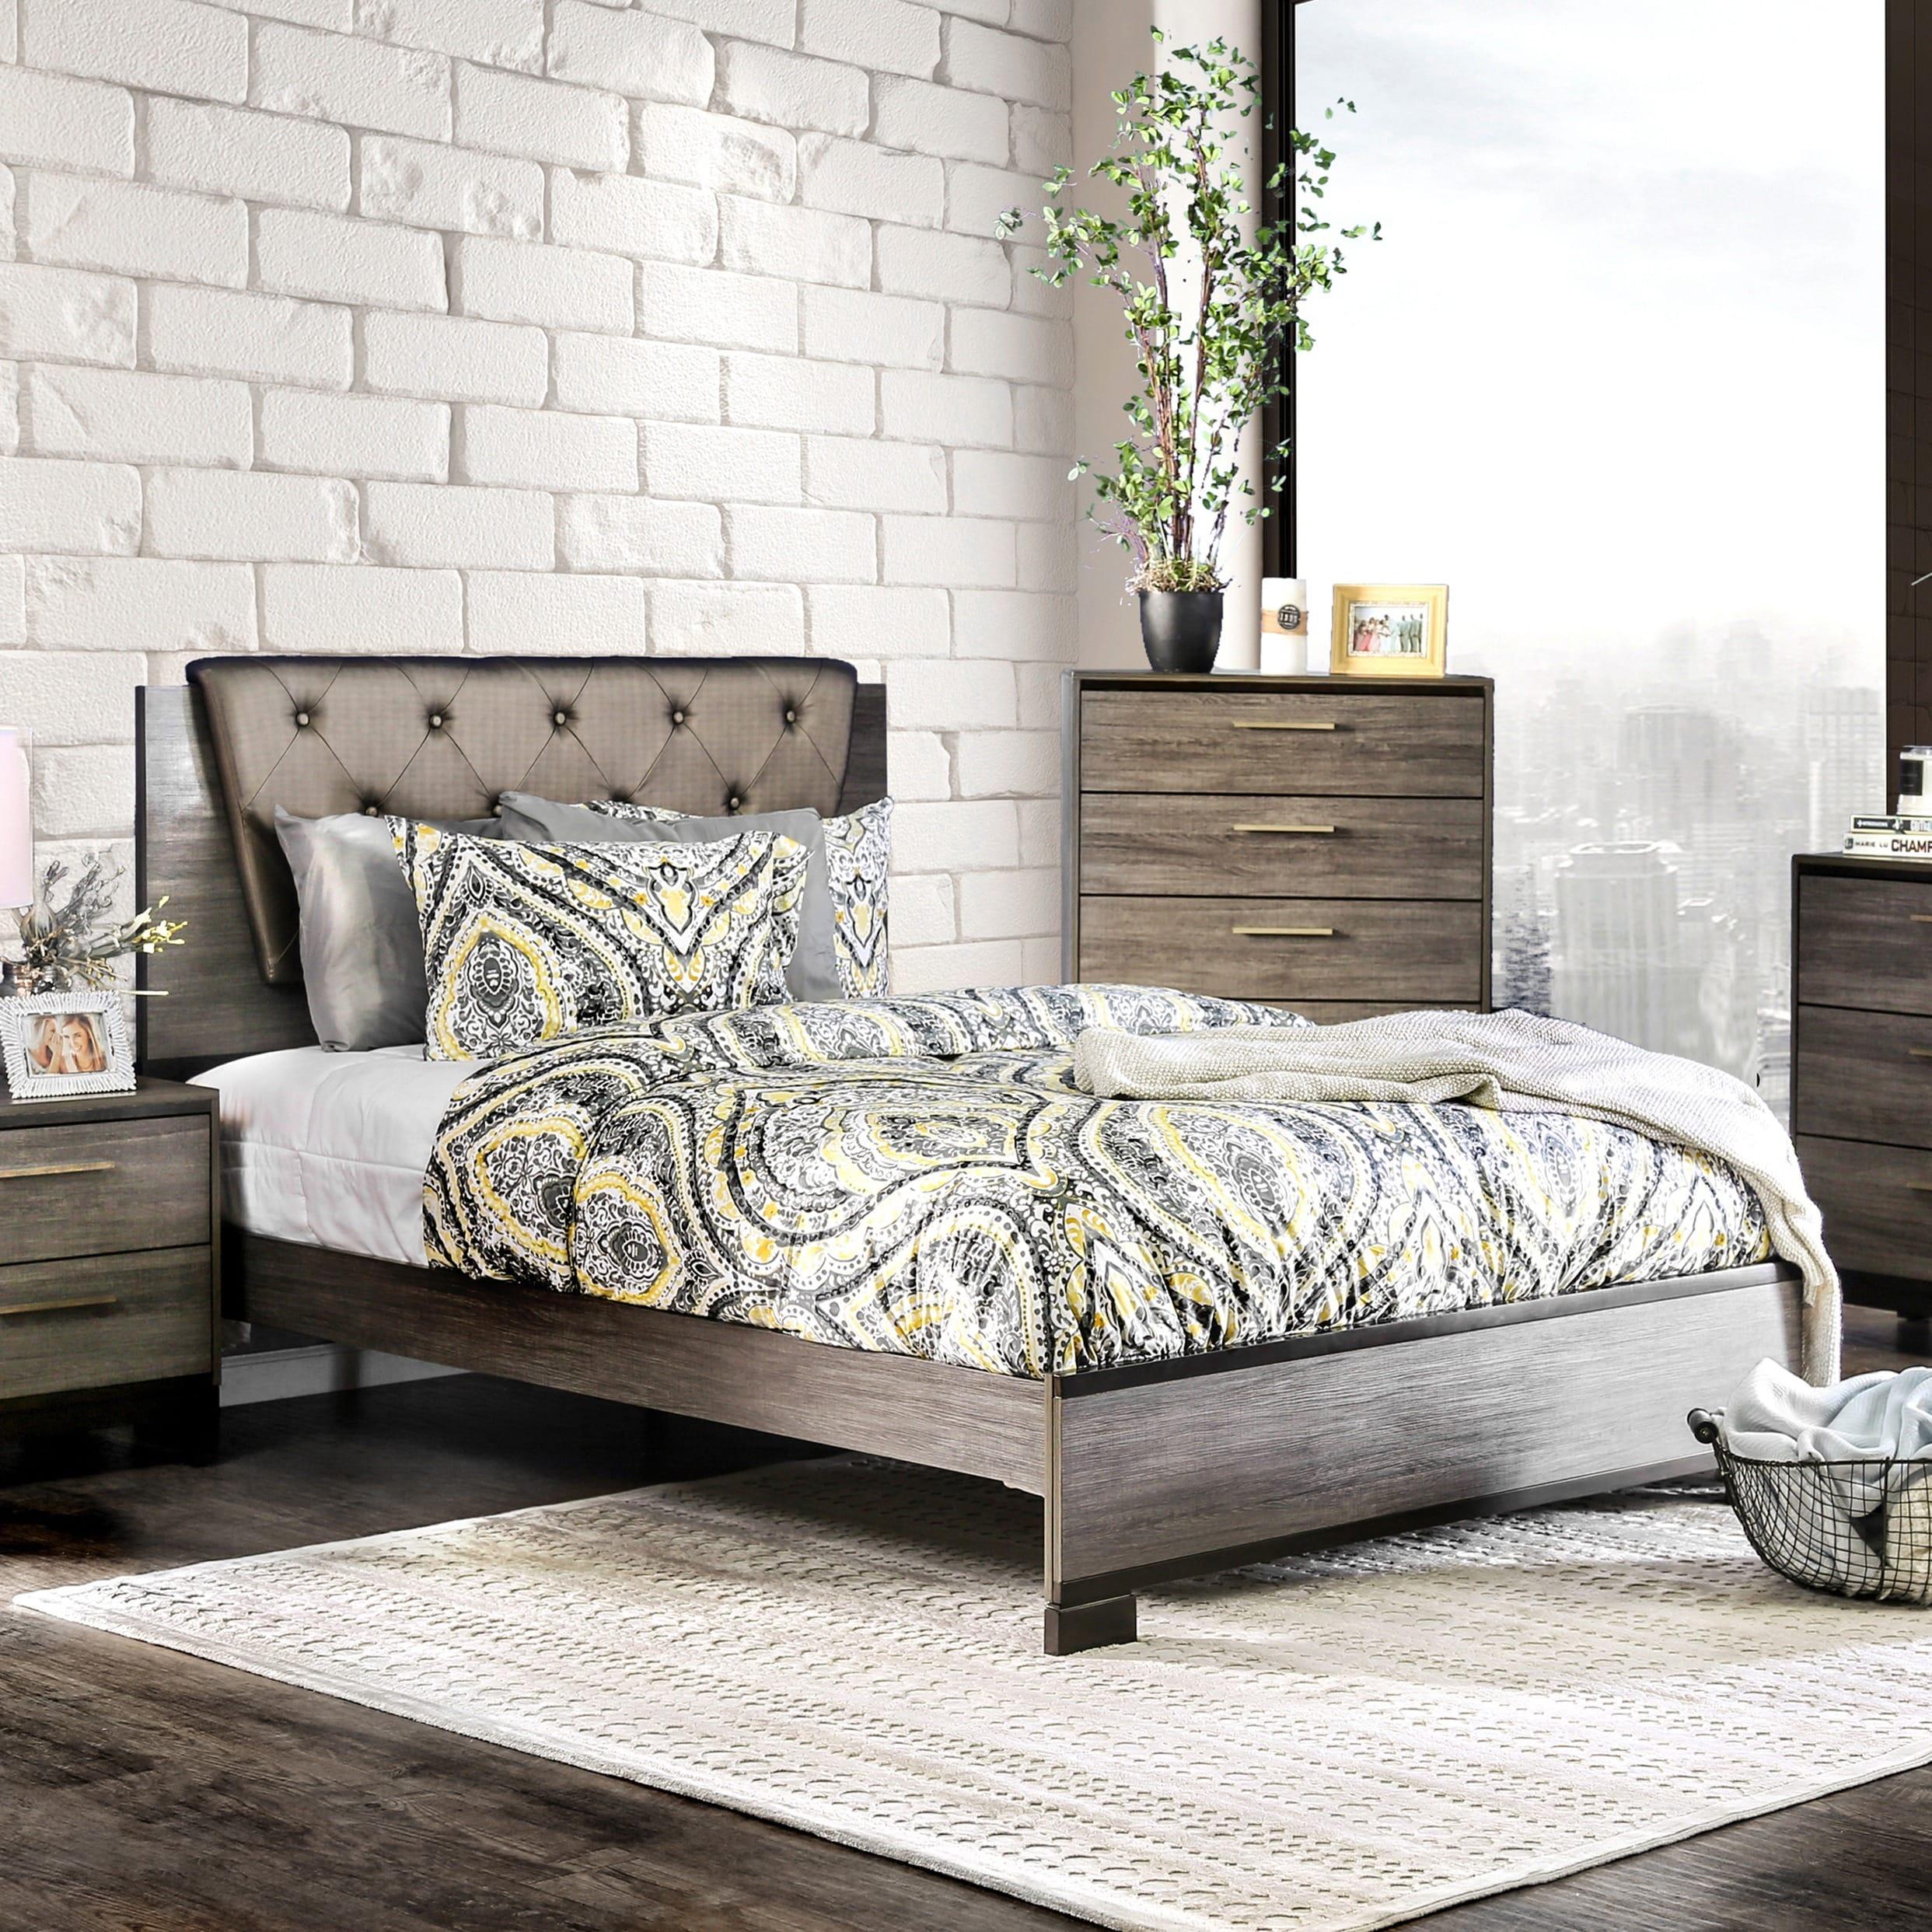 Furniture of America Silvine Contemporary Antique Grey Be...